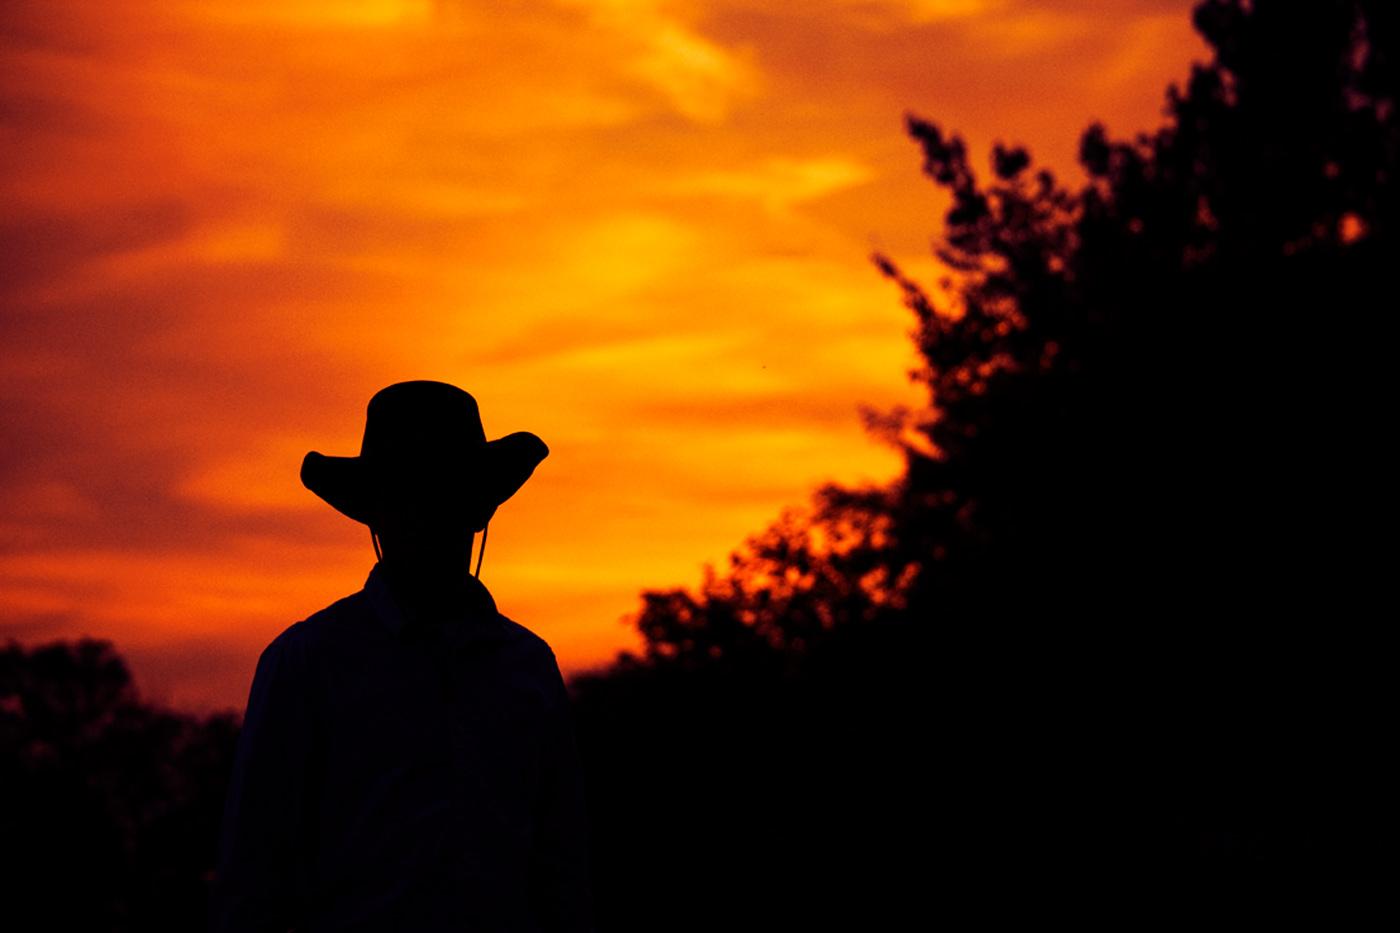 redcowboy.jpg